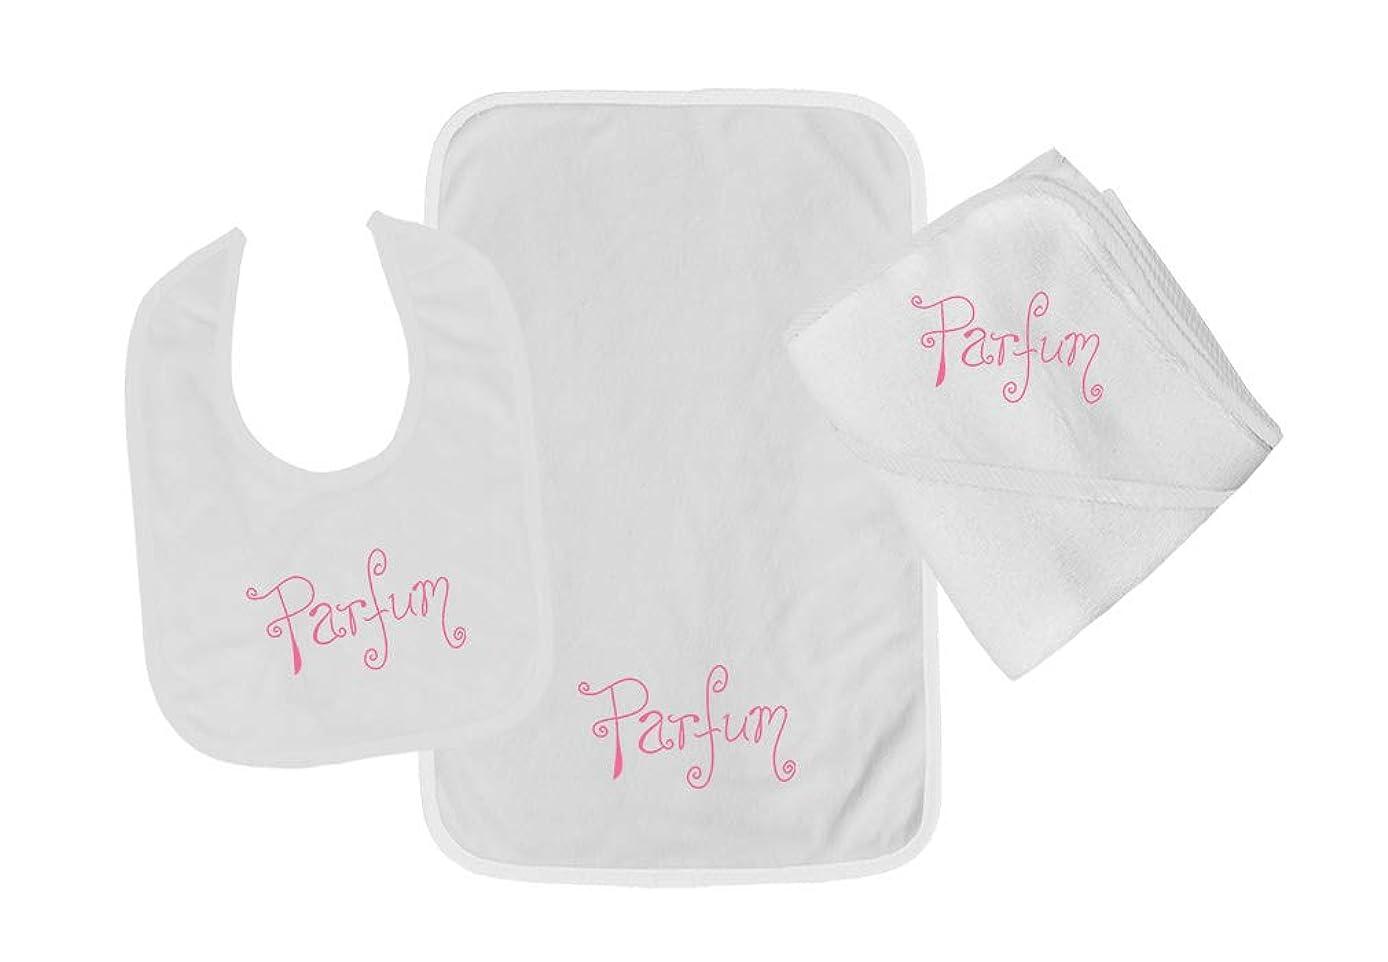 Parfum Cotton Boys-Girls Baby Bib-Burb-Towel Set, One Size